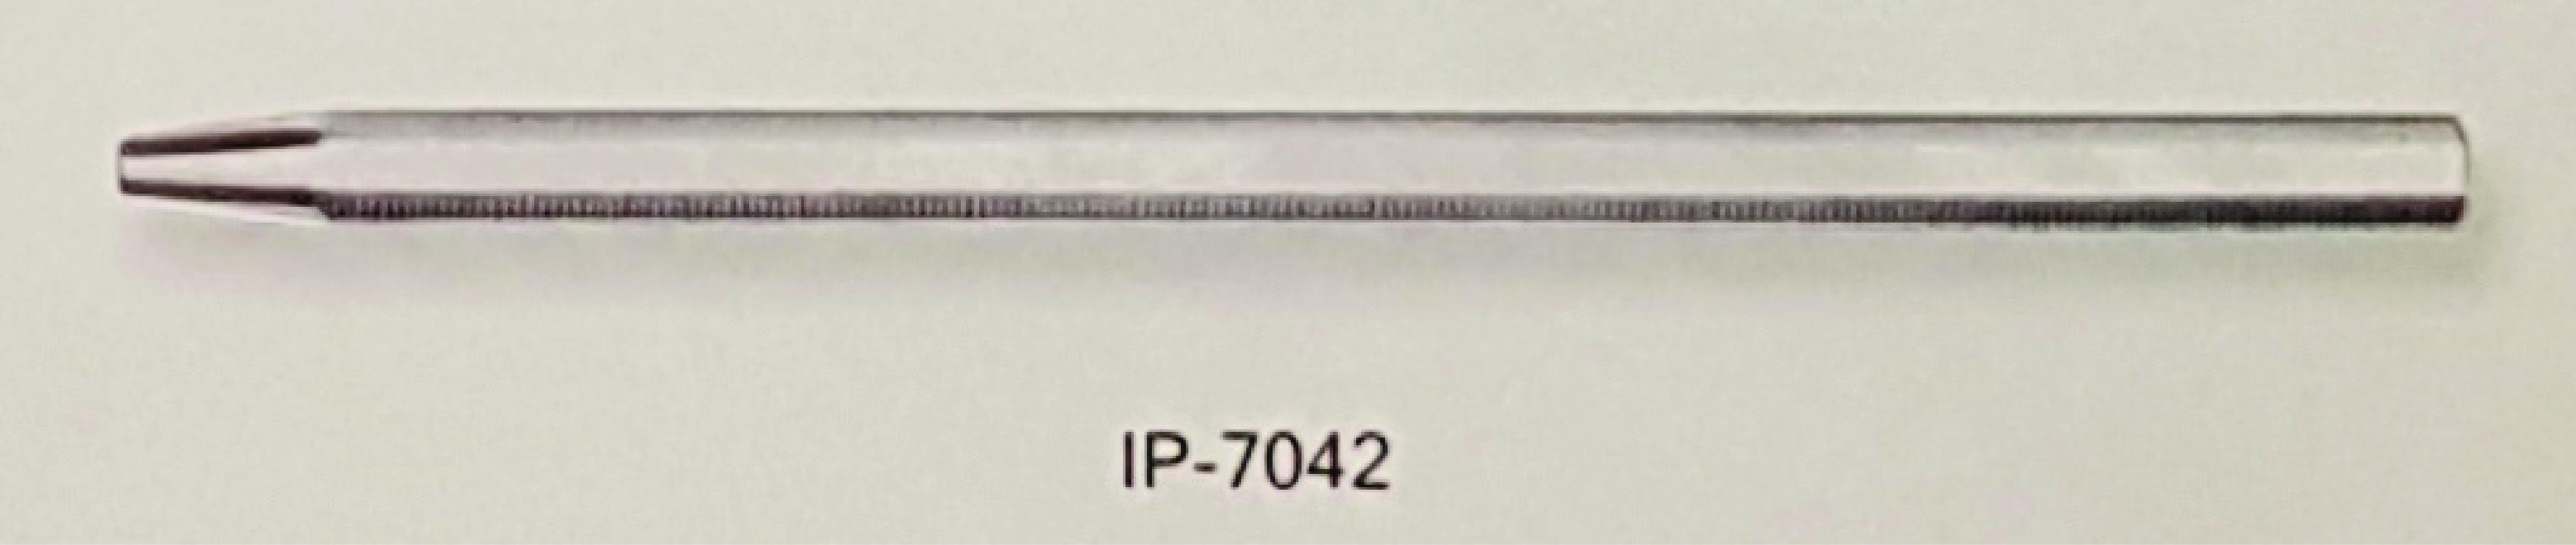 IP-7042